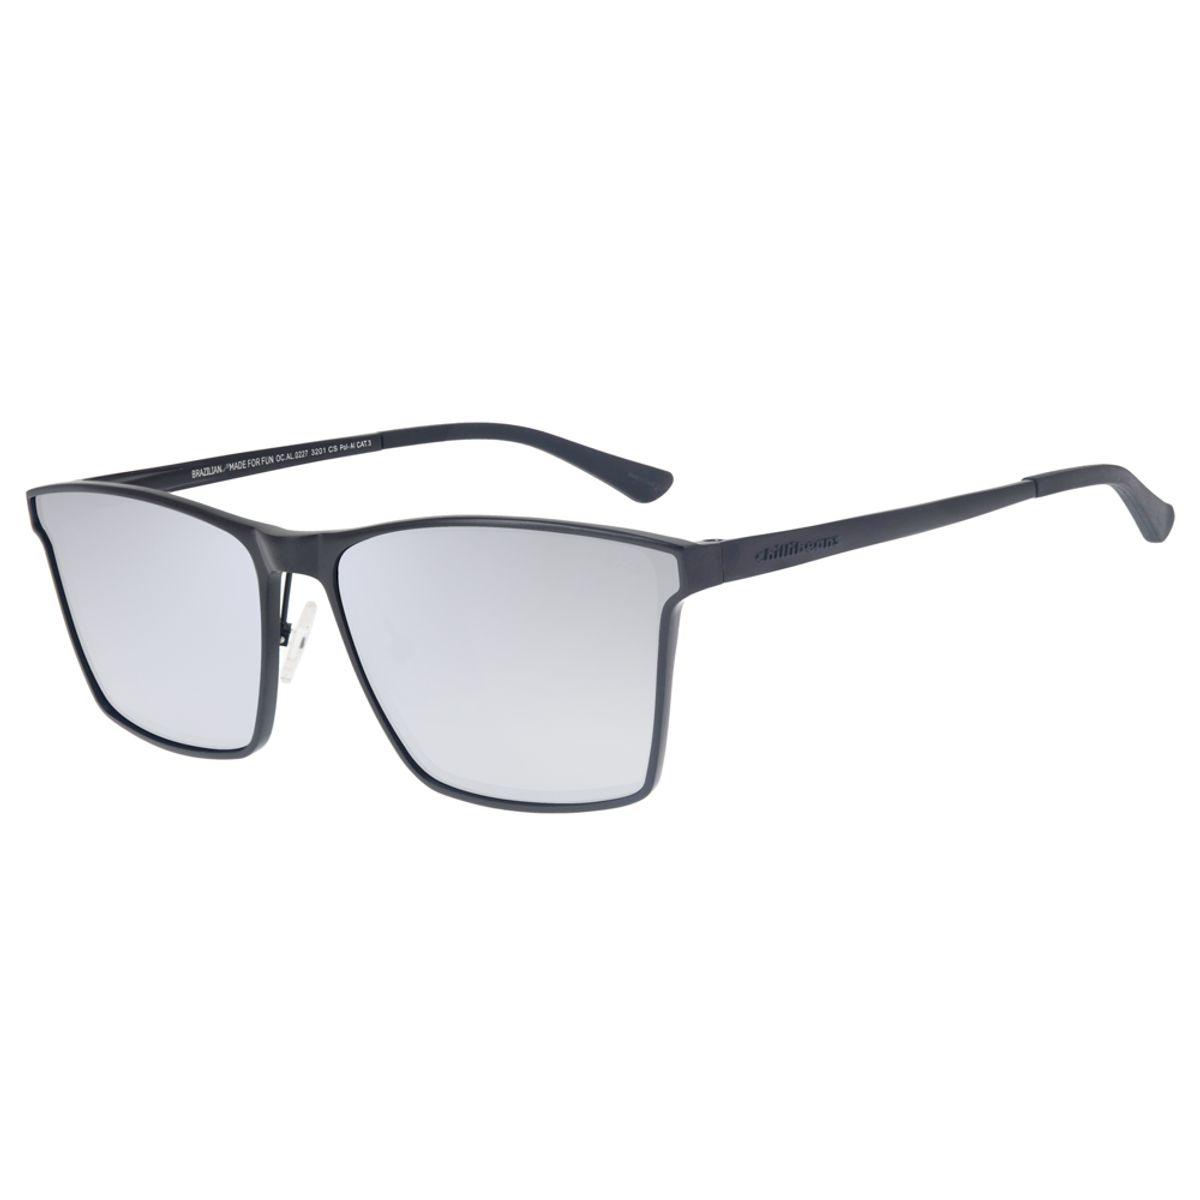 add3491ae Óculos de Sol Chilli Beans Masculino Alumínio Polarizado Espelhado ...